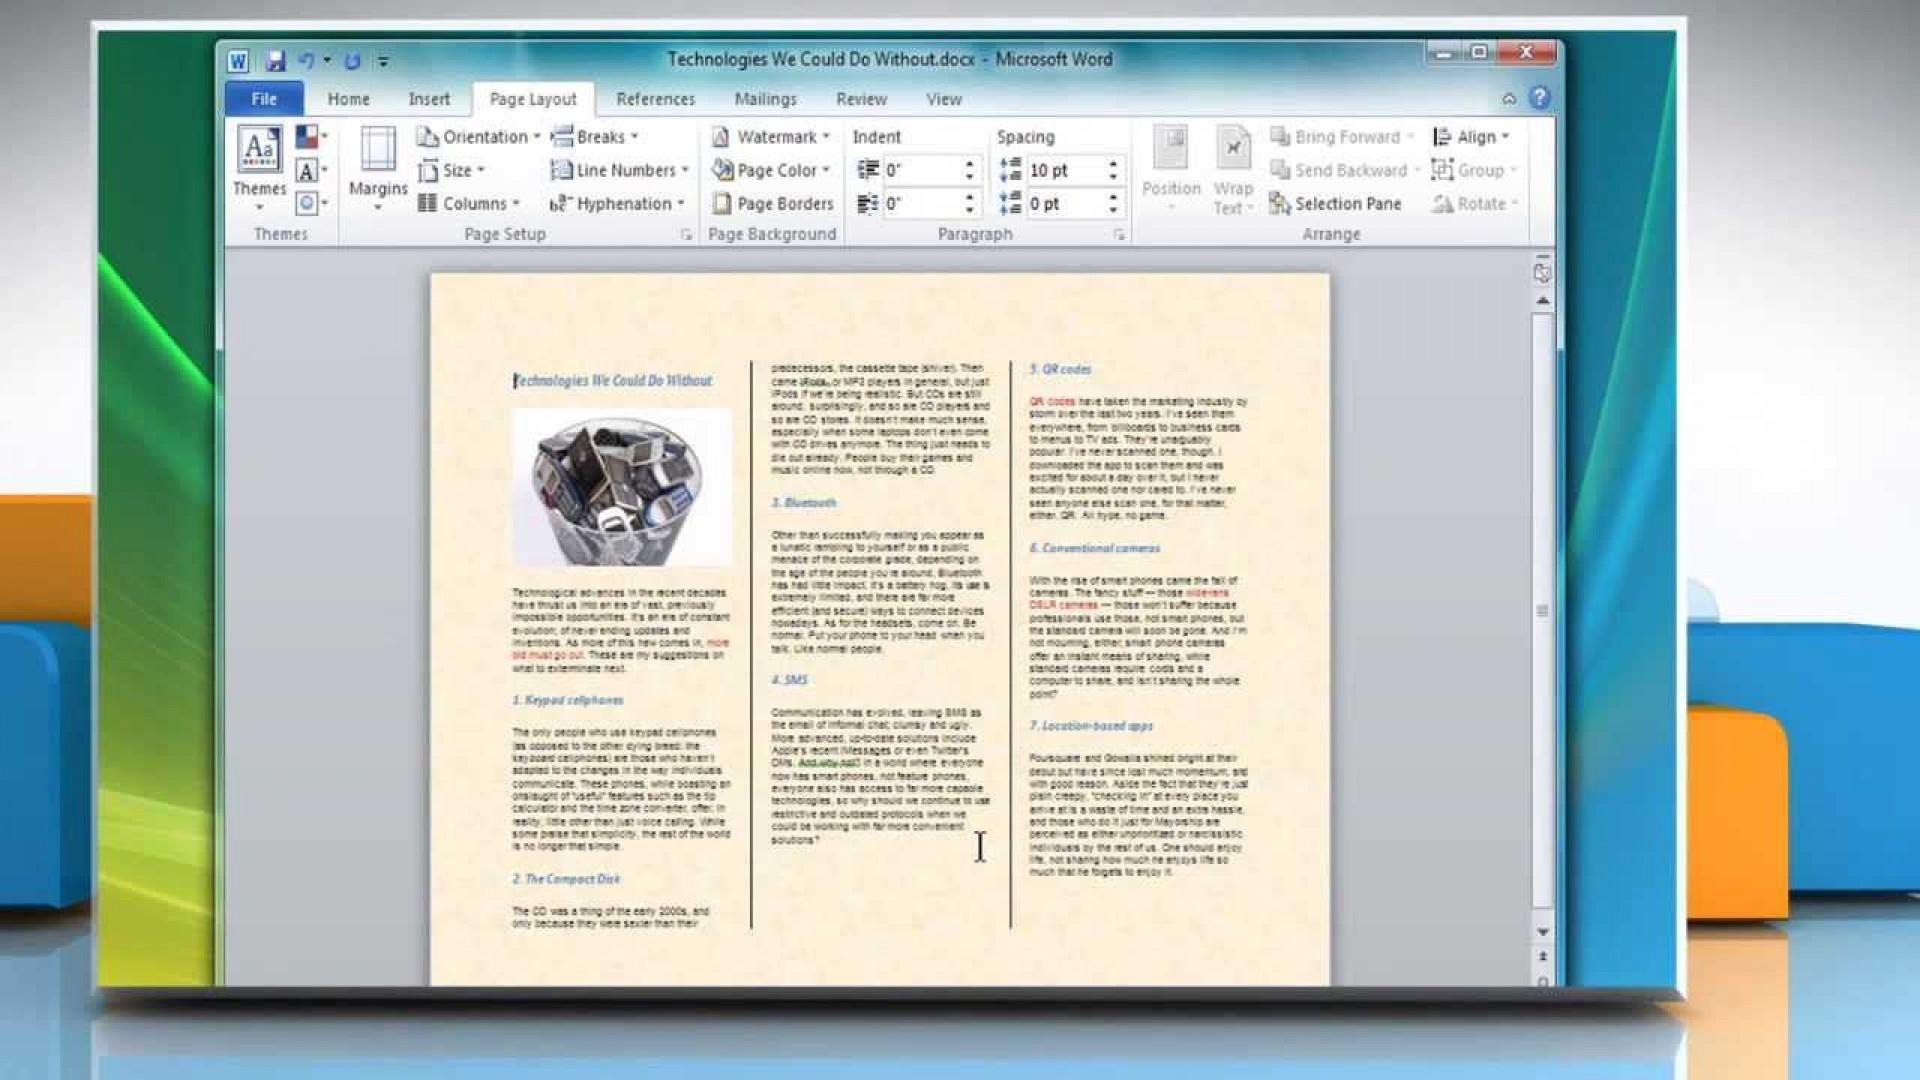 005 Impressive Word Tri Fold Brochure Template Inspiration  2010 Microsoft M Office1920